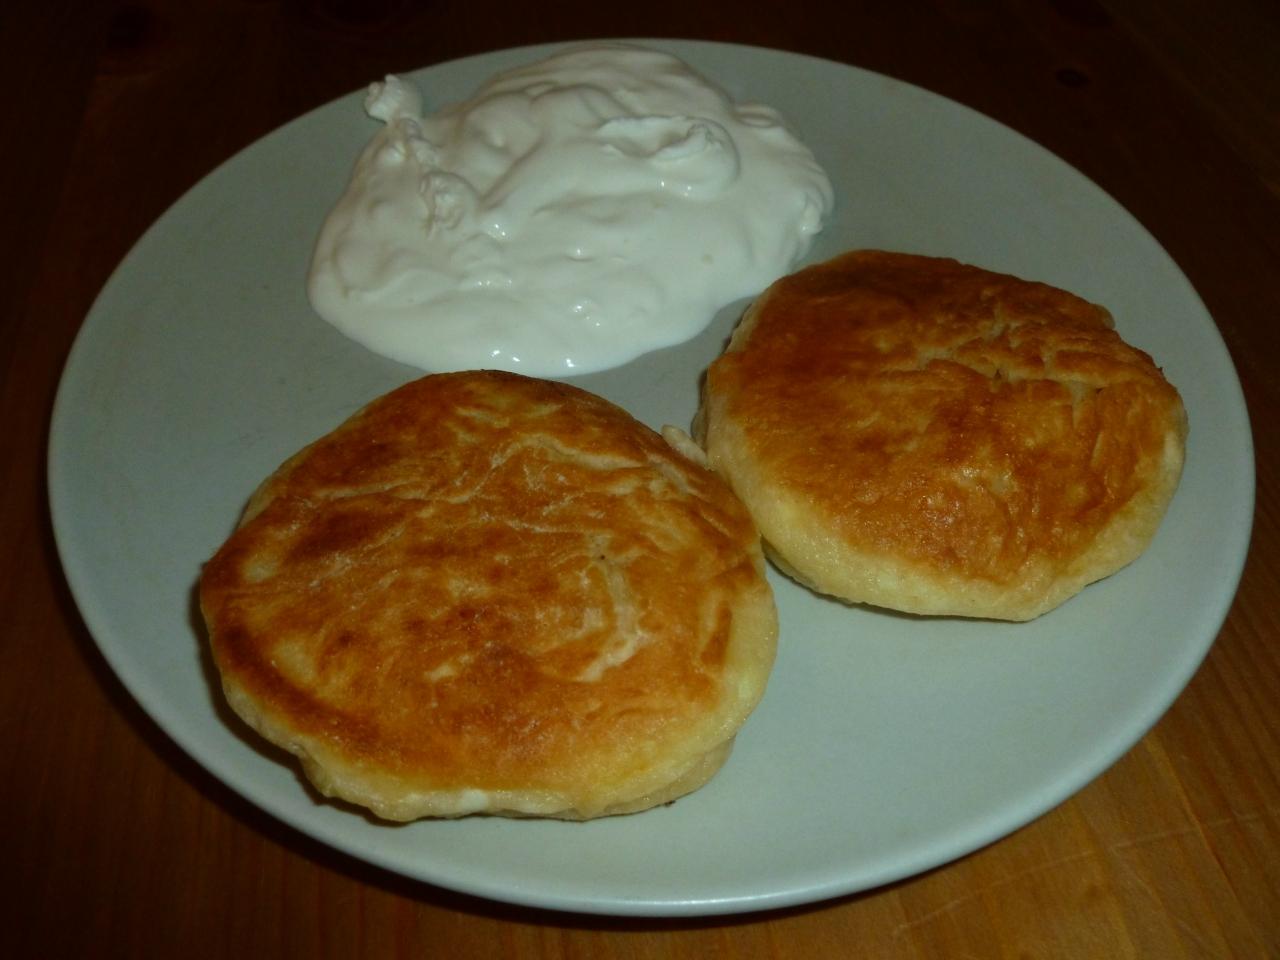 Maroosya scoop